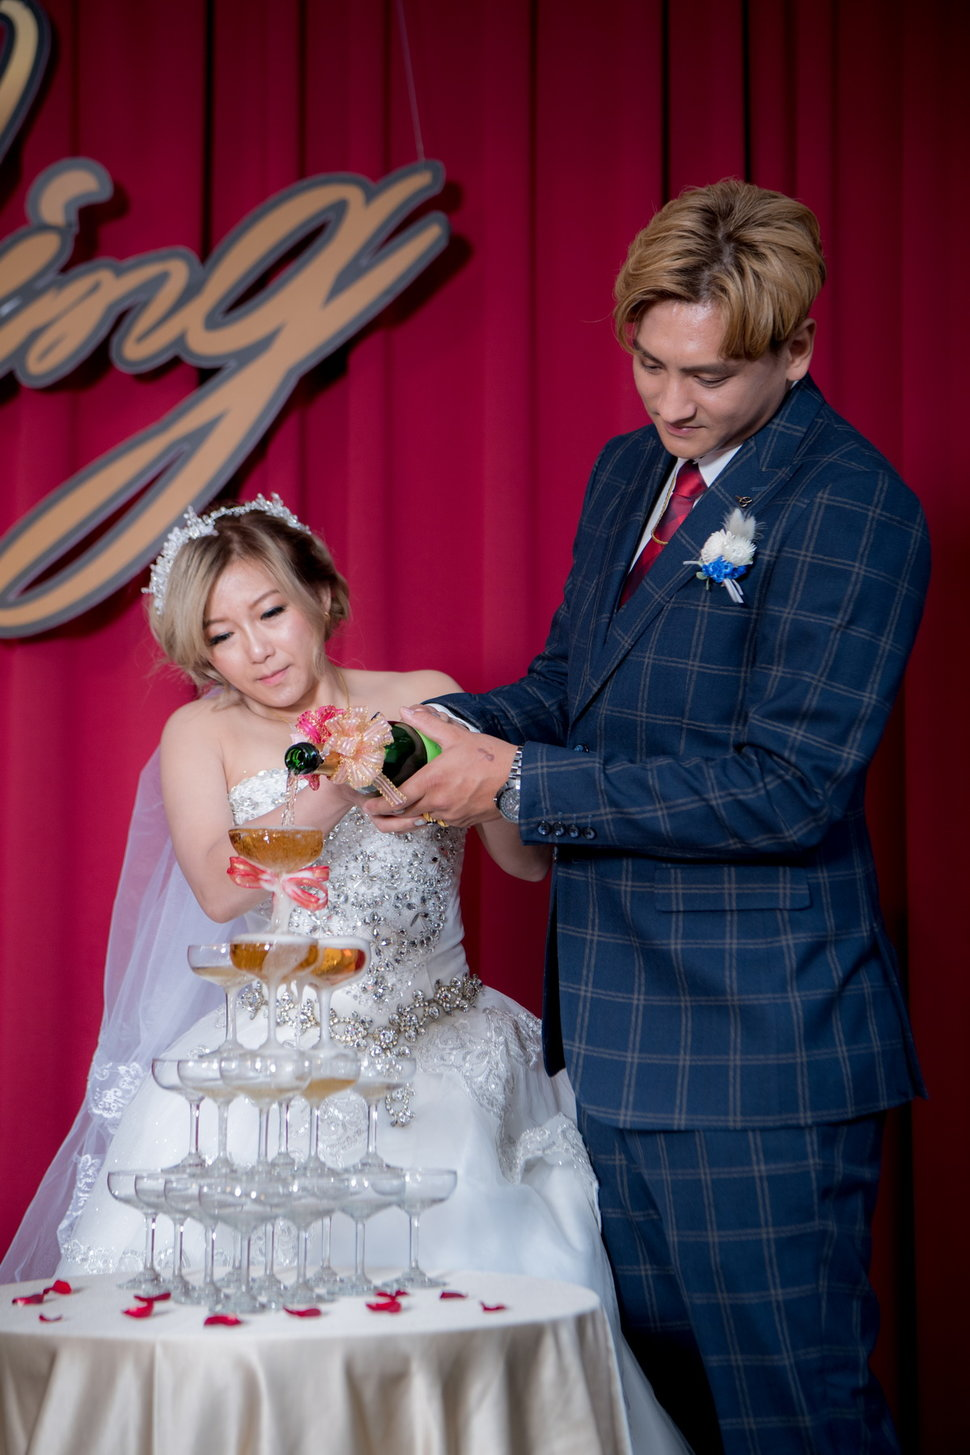 CON_1881 - 婚攝溏威自助婚紗婚禮紀錄新秘孕寫真全家福《結婚吧》